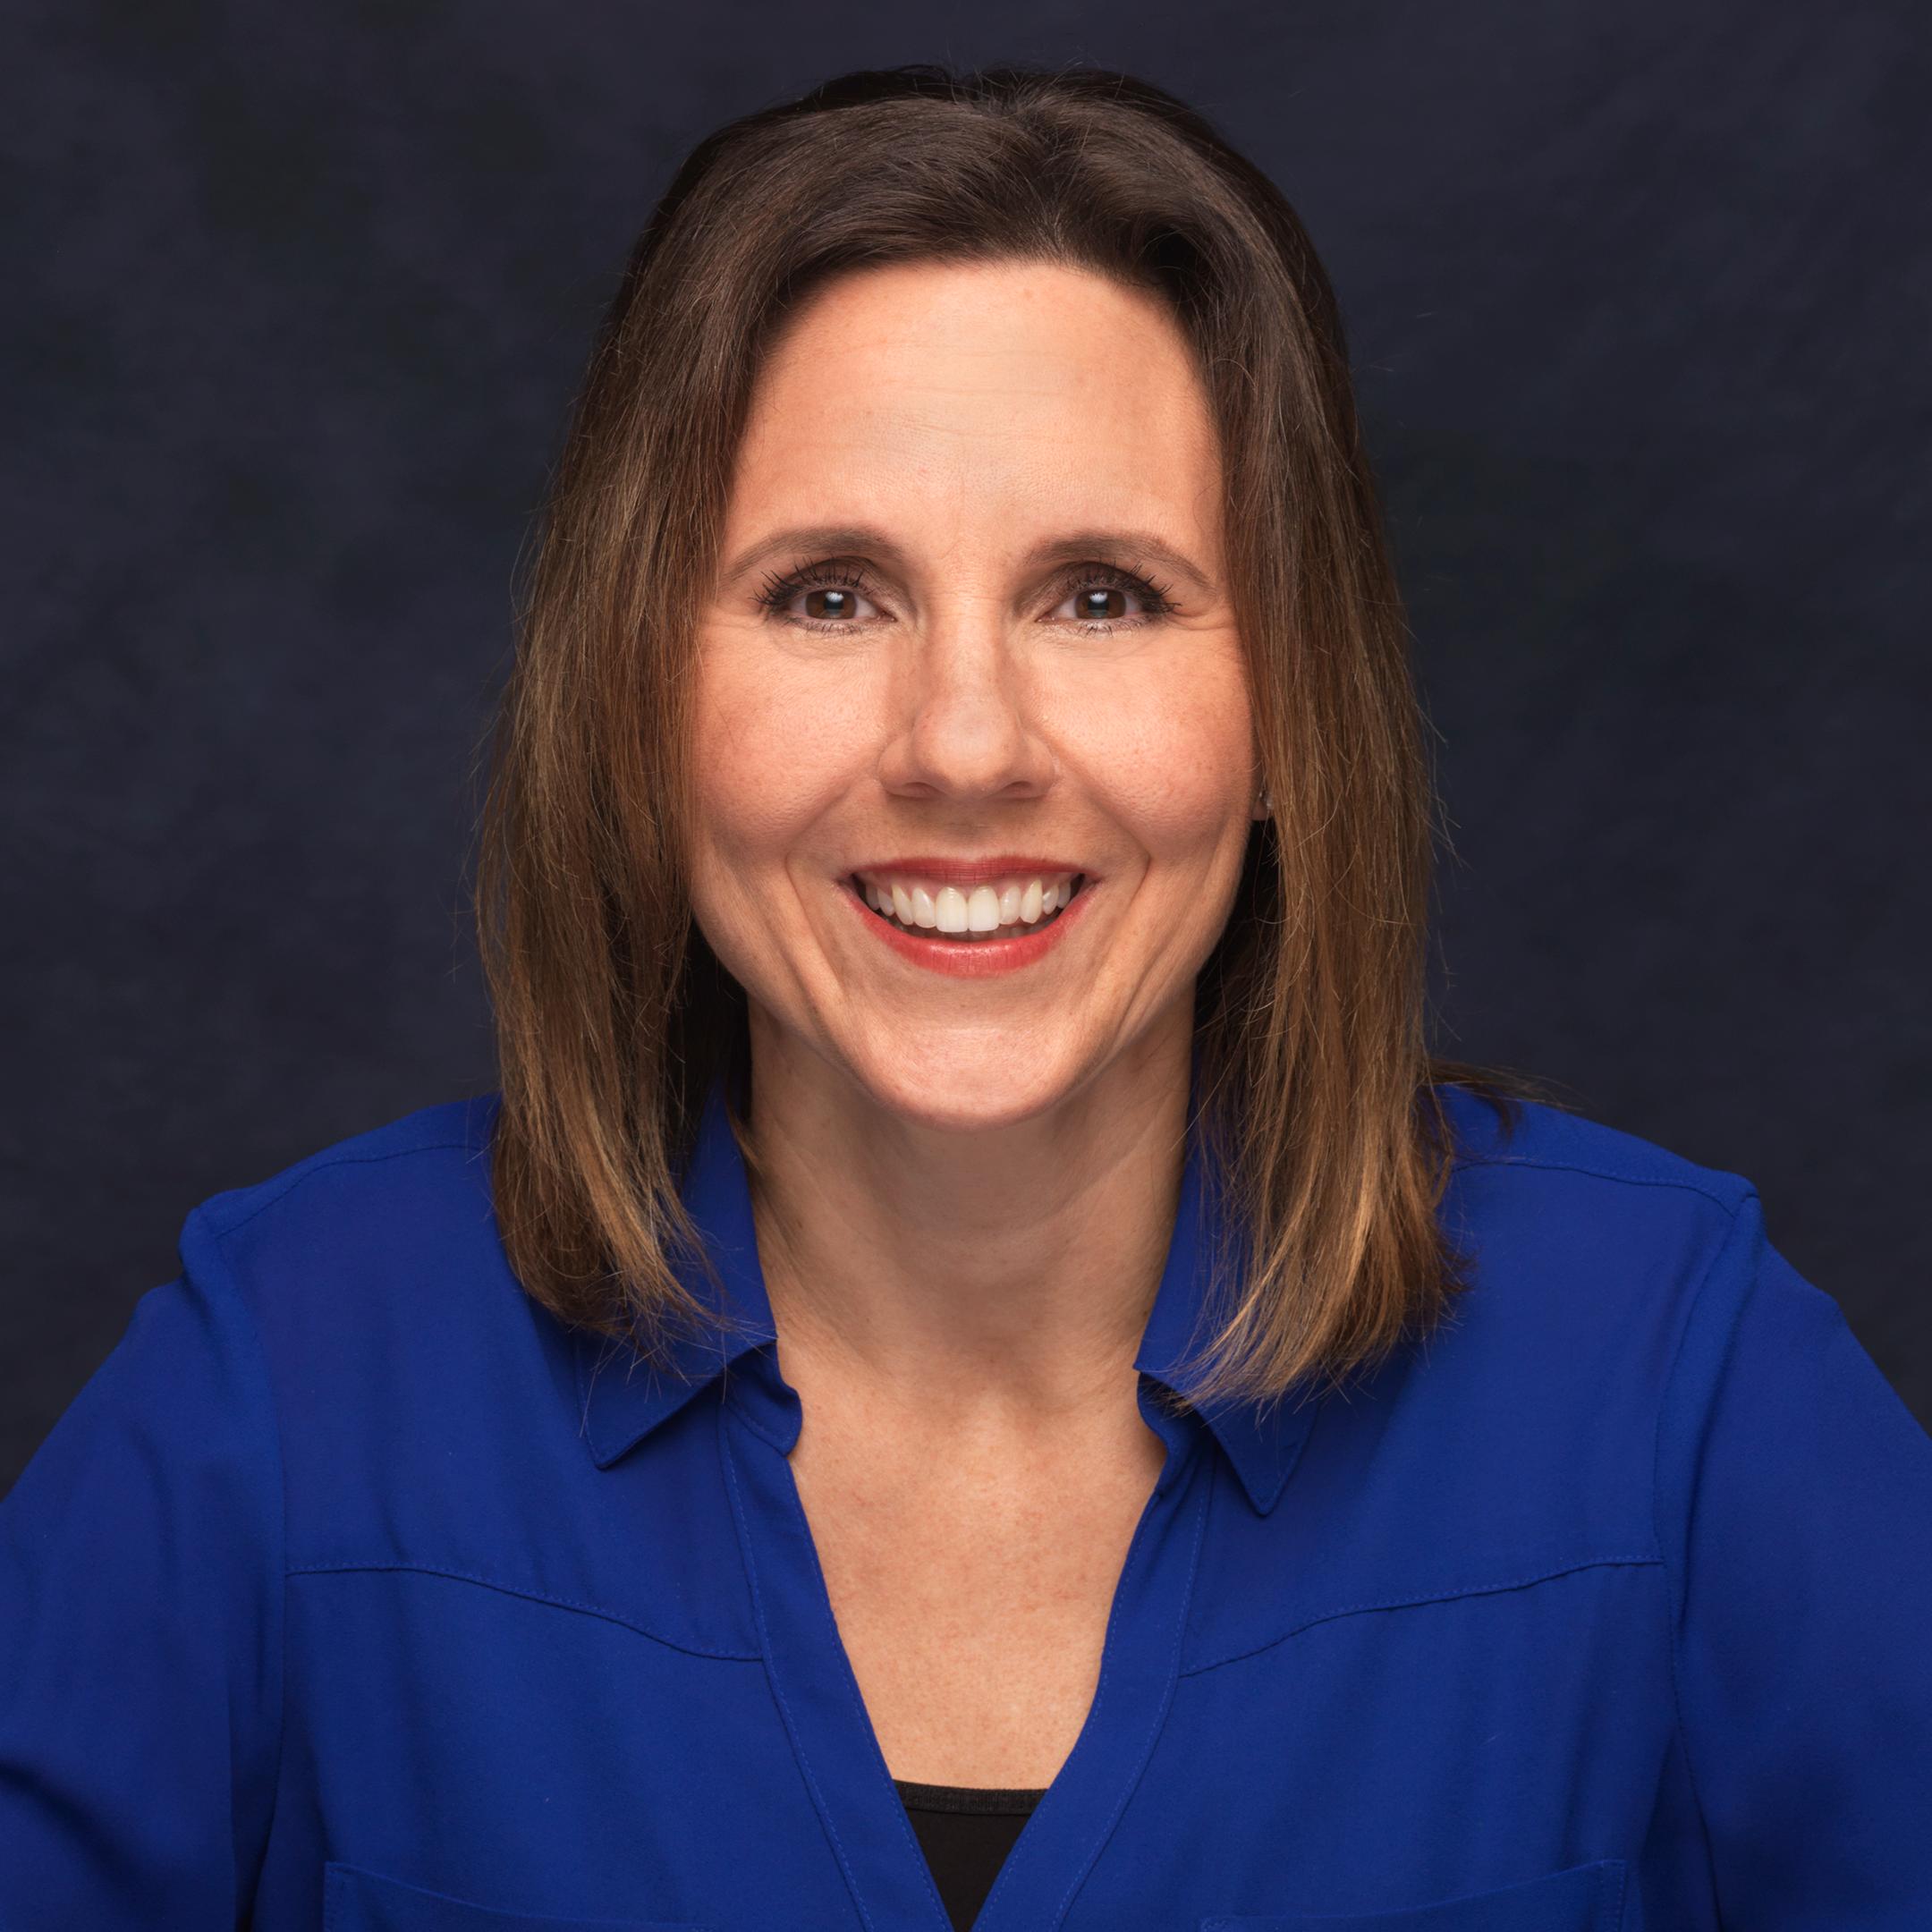 Holly Hawkins - Vice President, Human Resources, Vintage Wine Estates